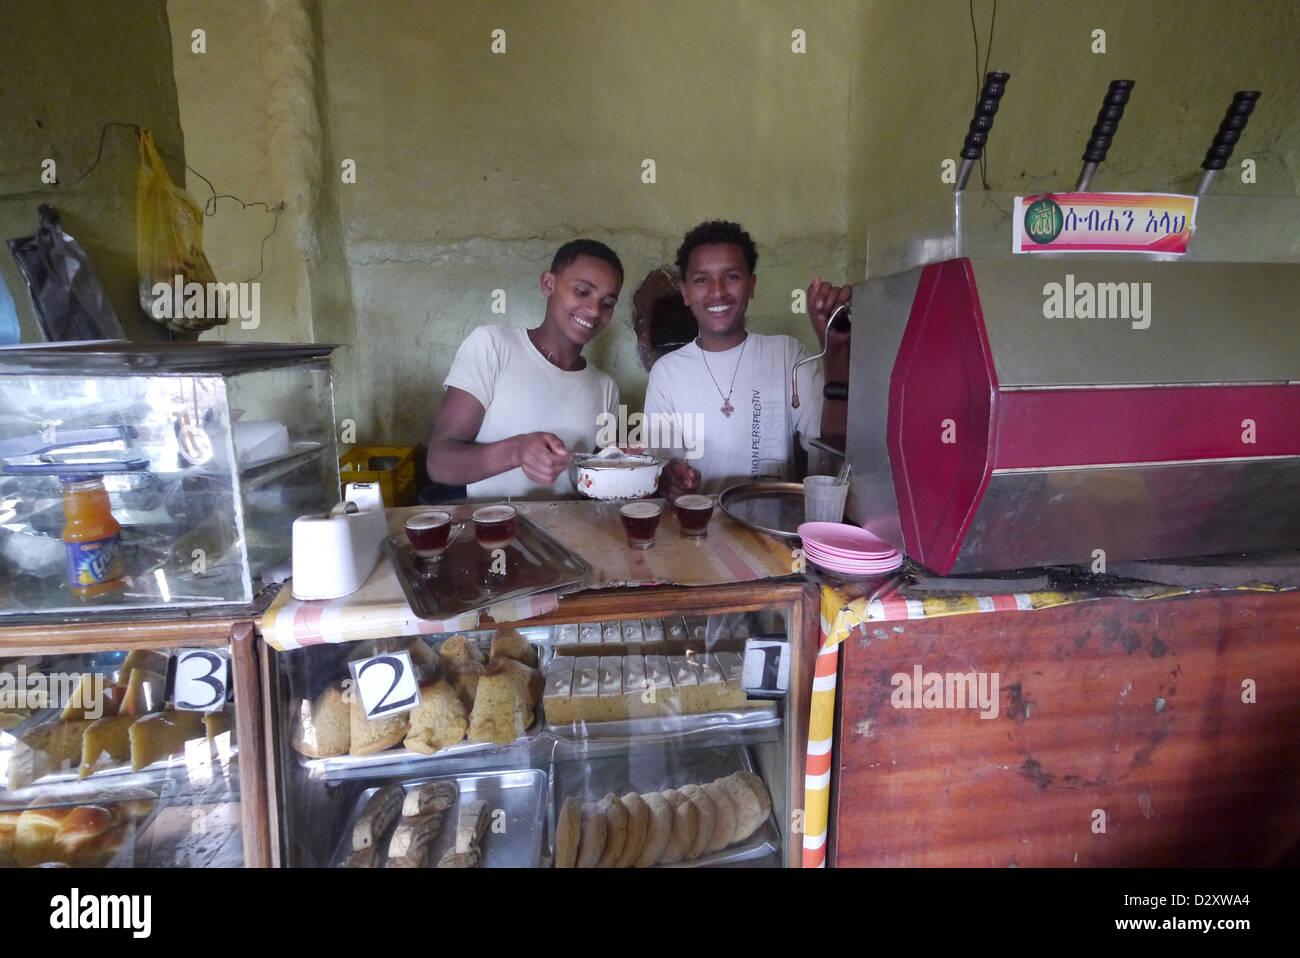 ethiopia salam cafe chagni beni shangul gumuz region employees espresso machine coffee labor food economy 2012 Stock Photo